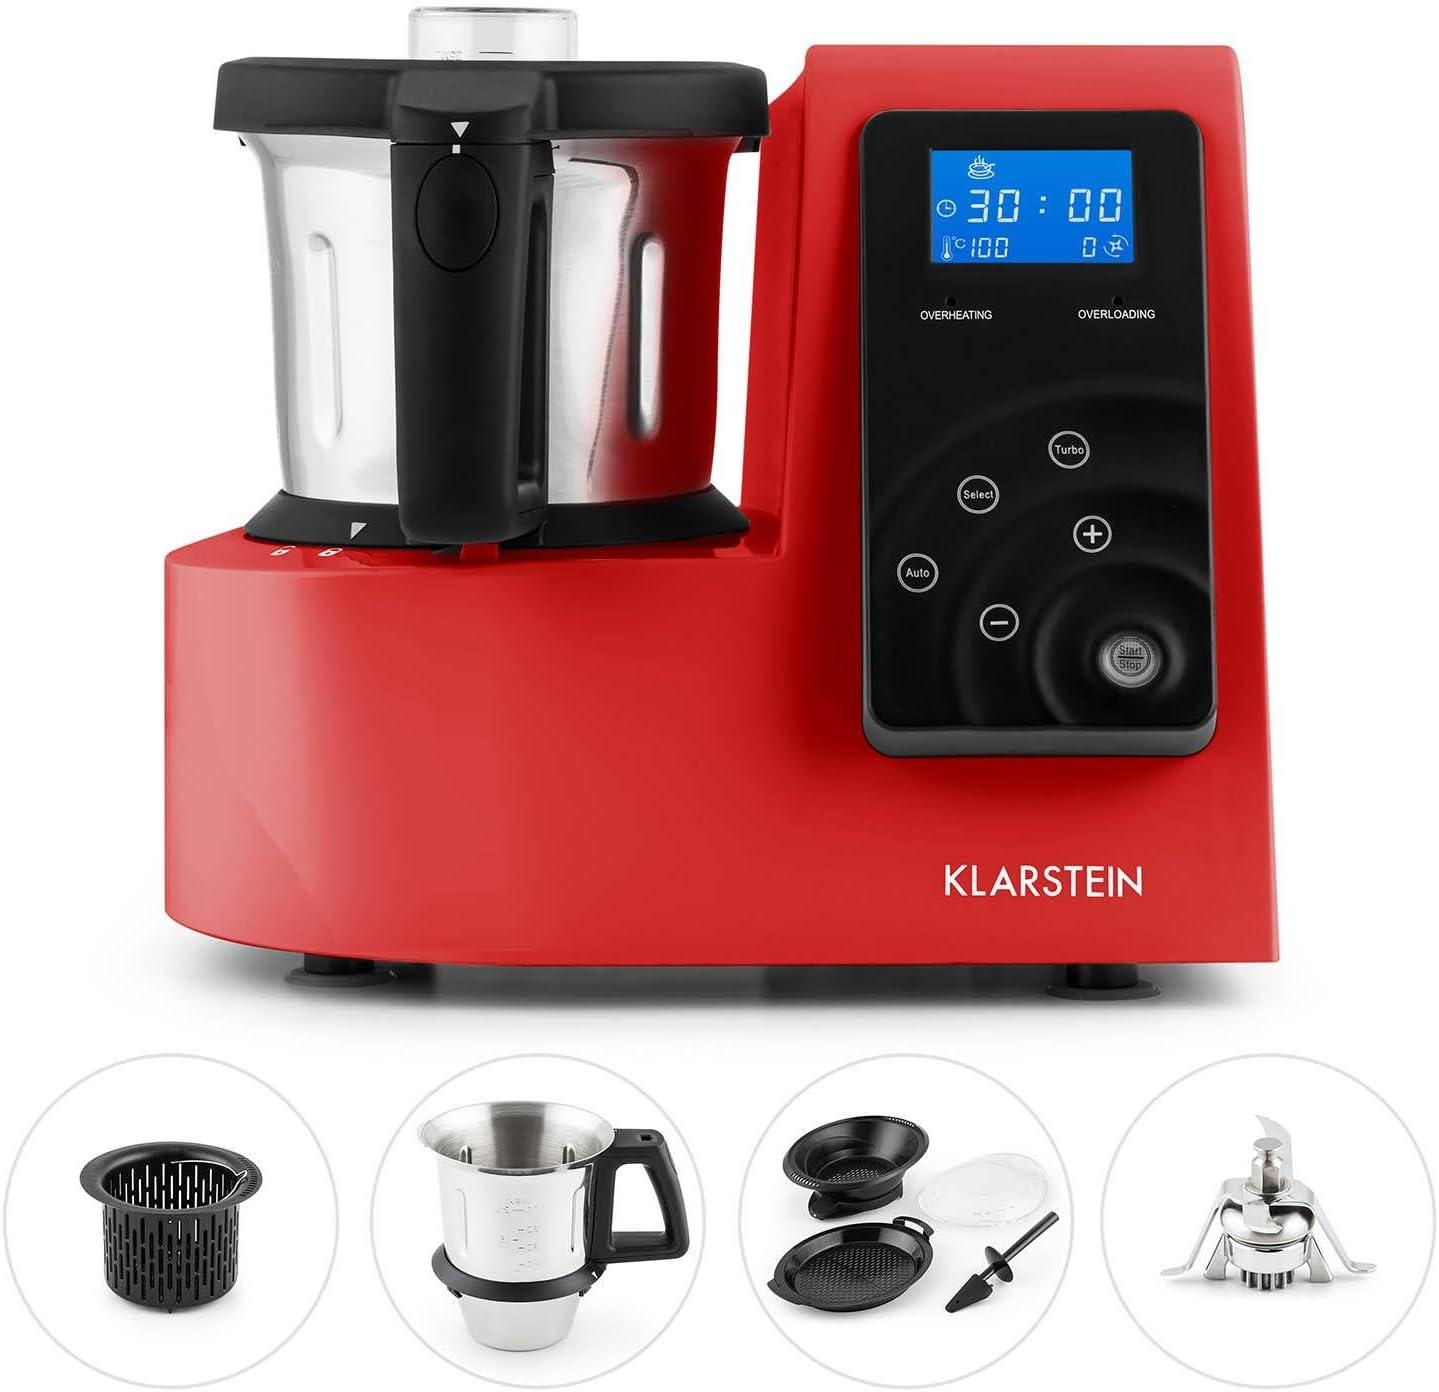 Klarstein Kitchen Hero - Robot de cocina rojo: Amazon.es: Hogar